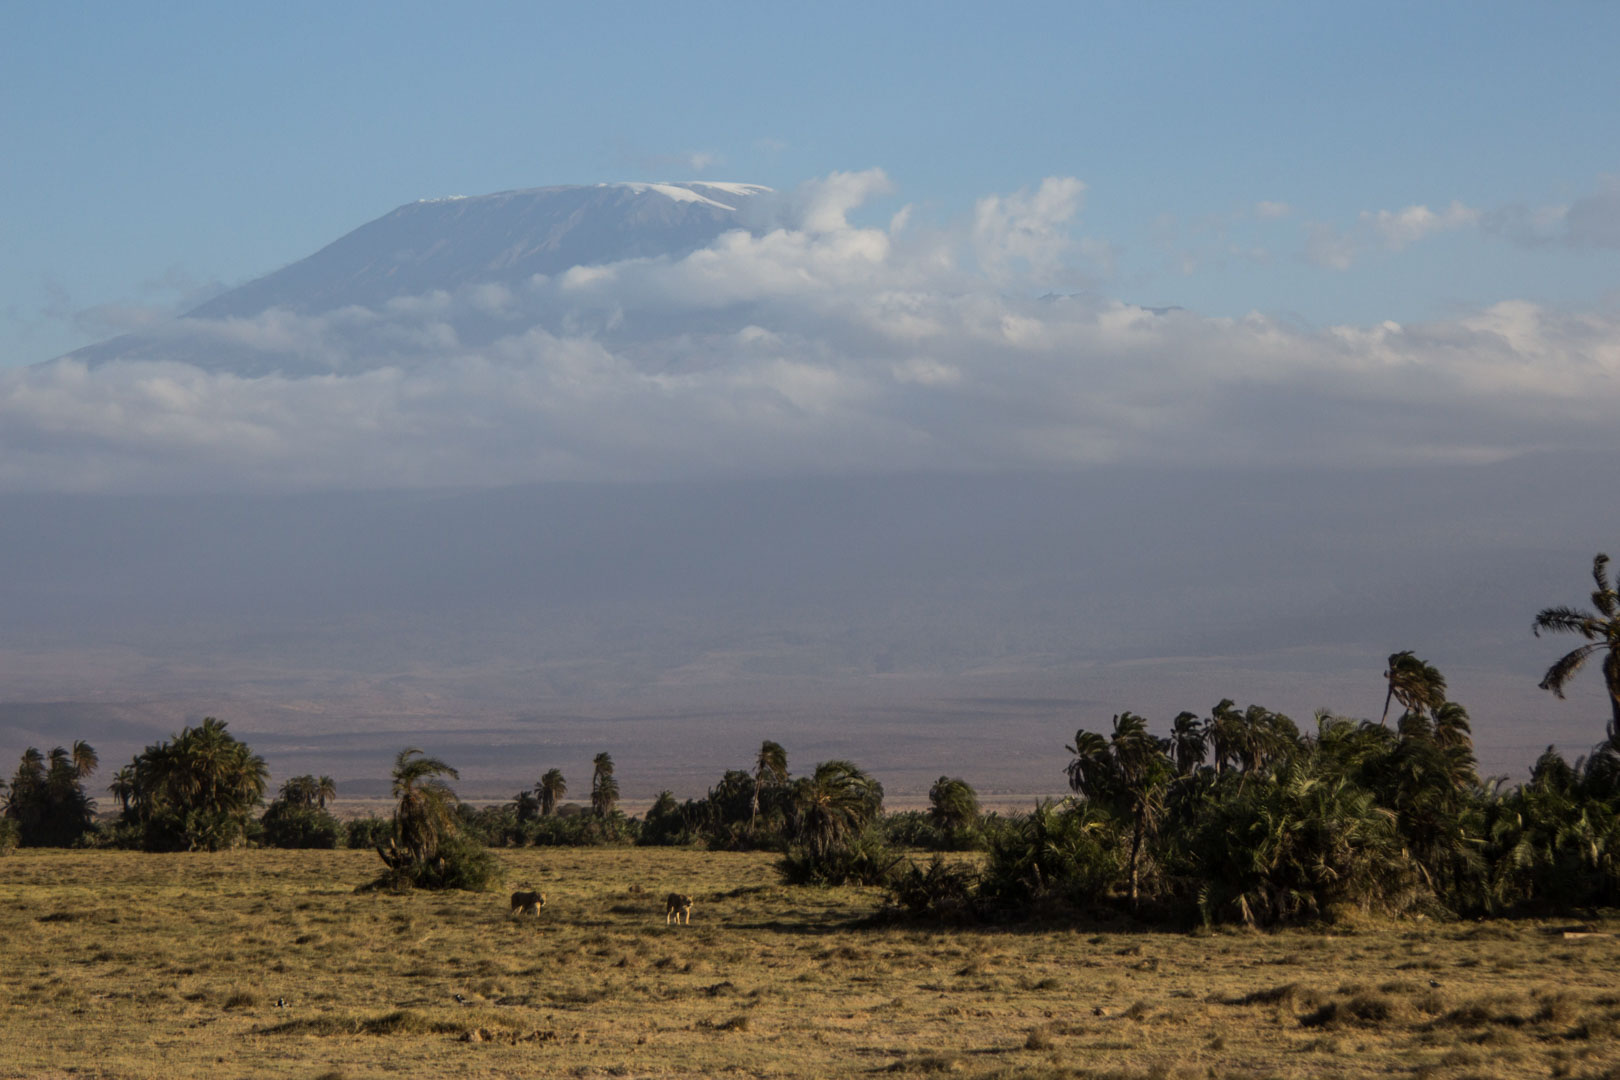 Leonas acercándose, Parque Nacional de Amboseli, Kenia